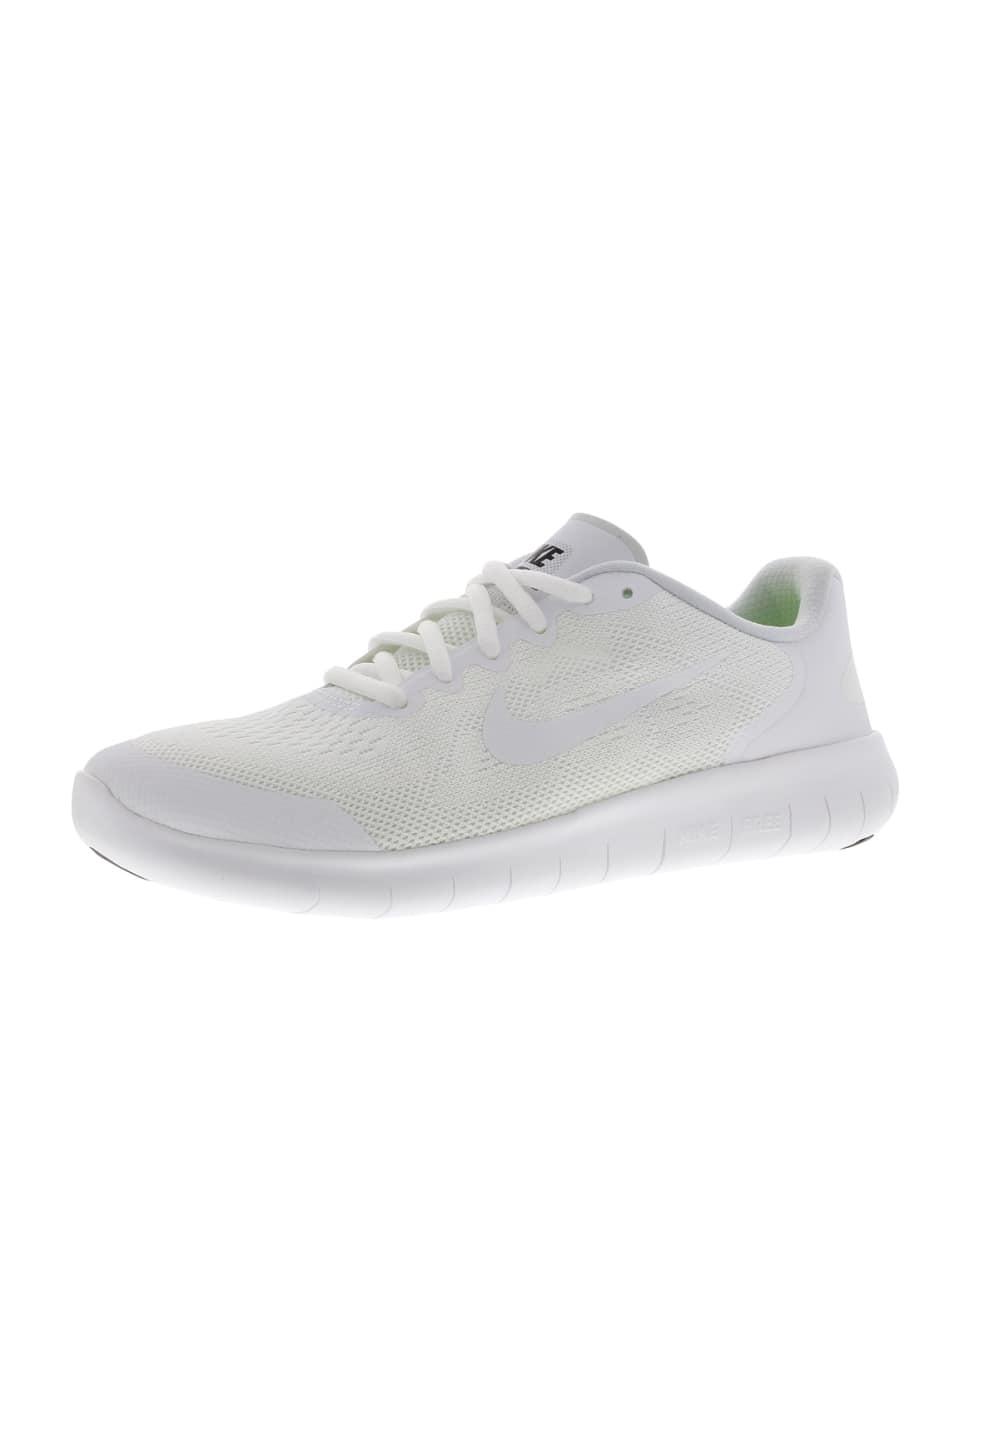 Blanc Running Free 2017 Nike Boys Gs Rn Chaussures zpqULSVMG